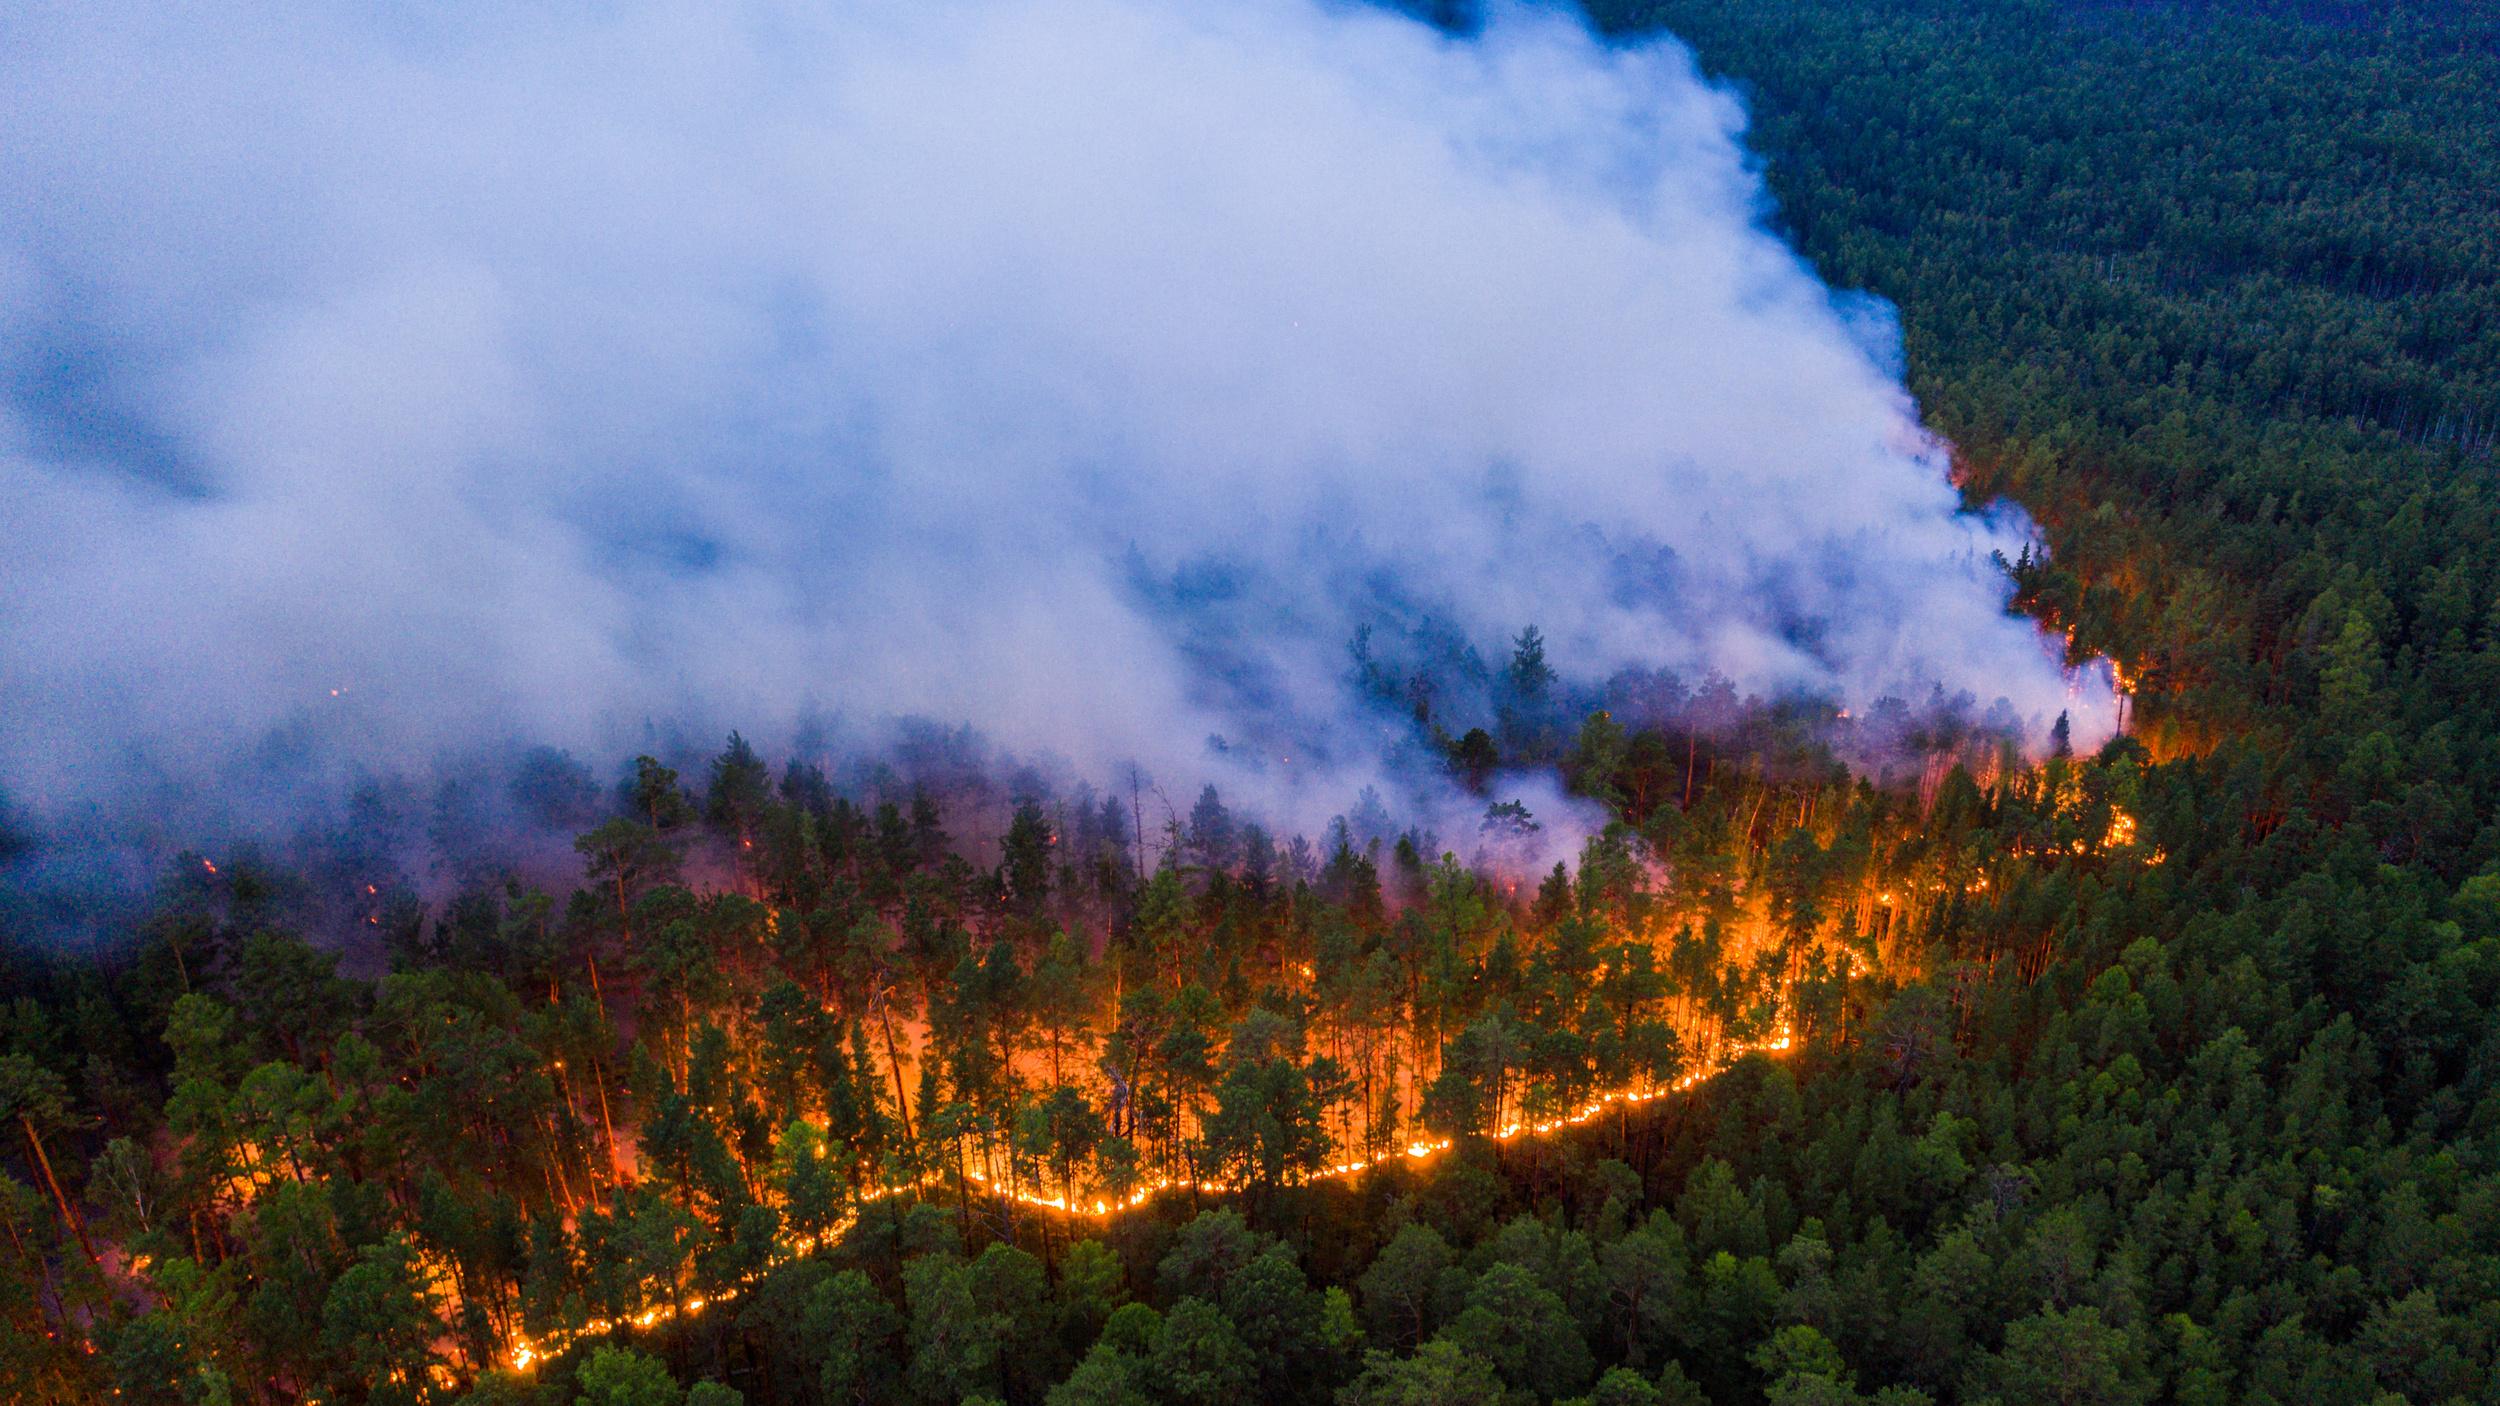 El incendio en Krasnoyarsk (Julia Petrenko/Greenpeace via REUTERS)